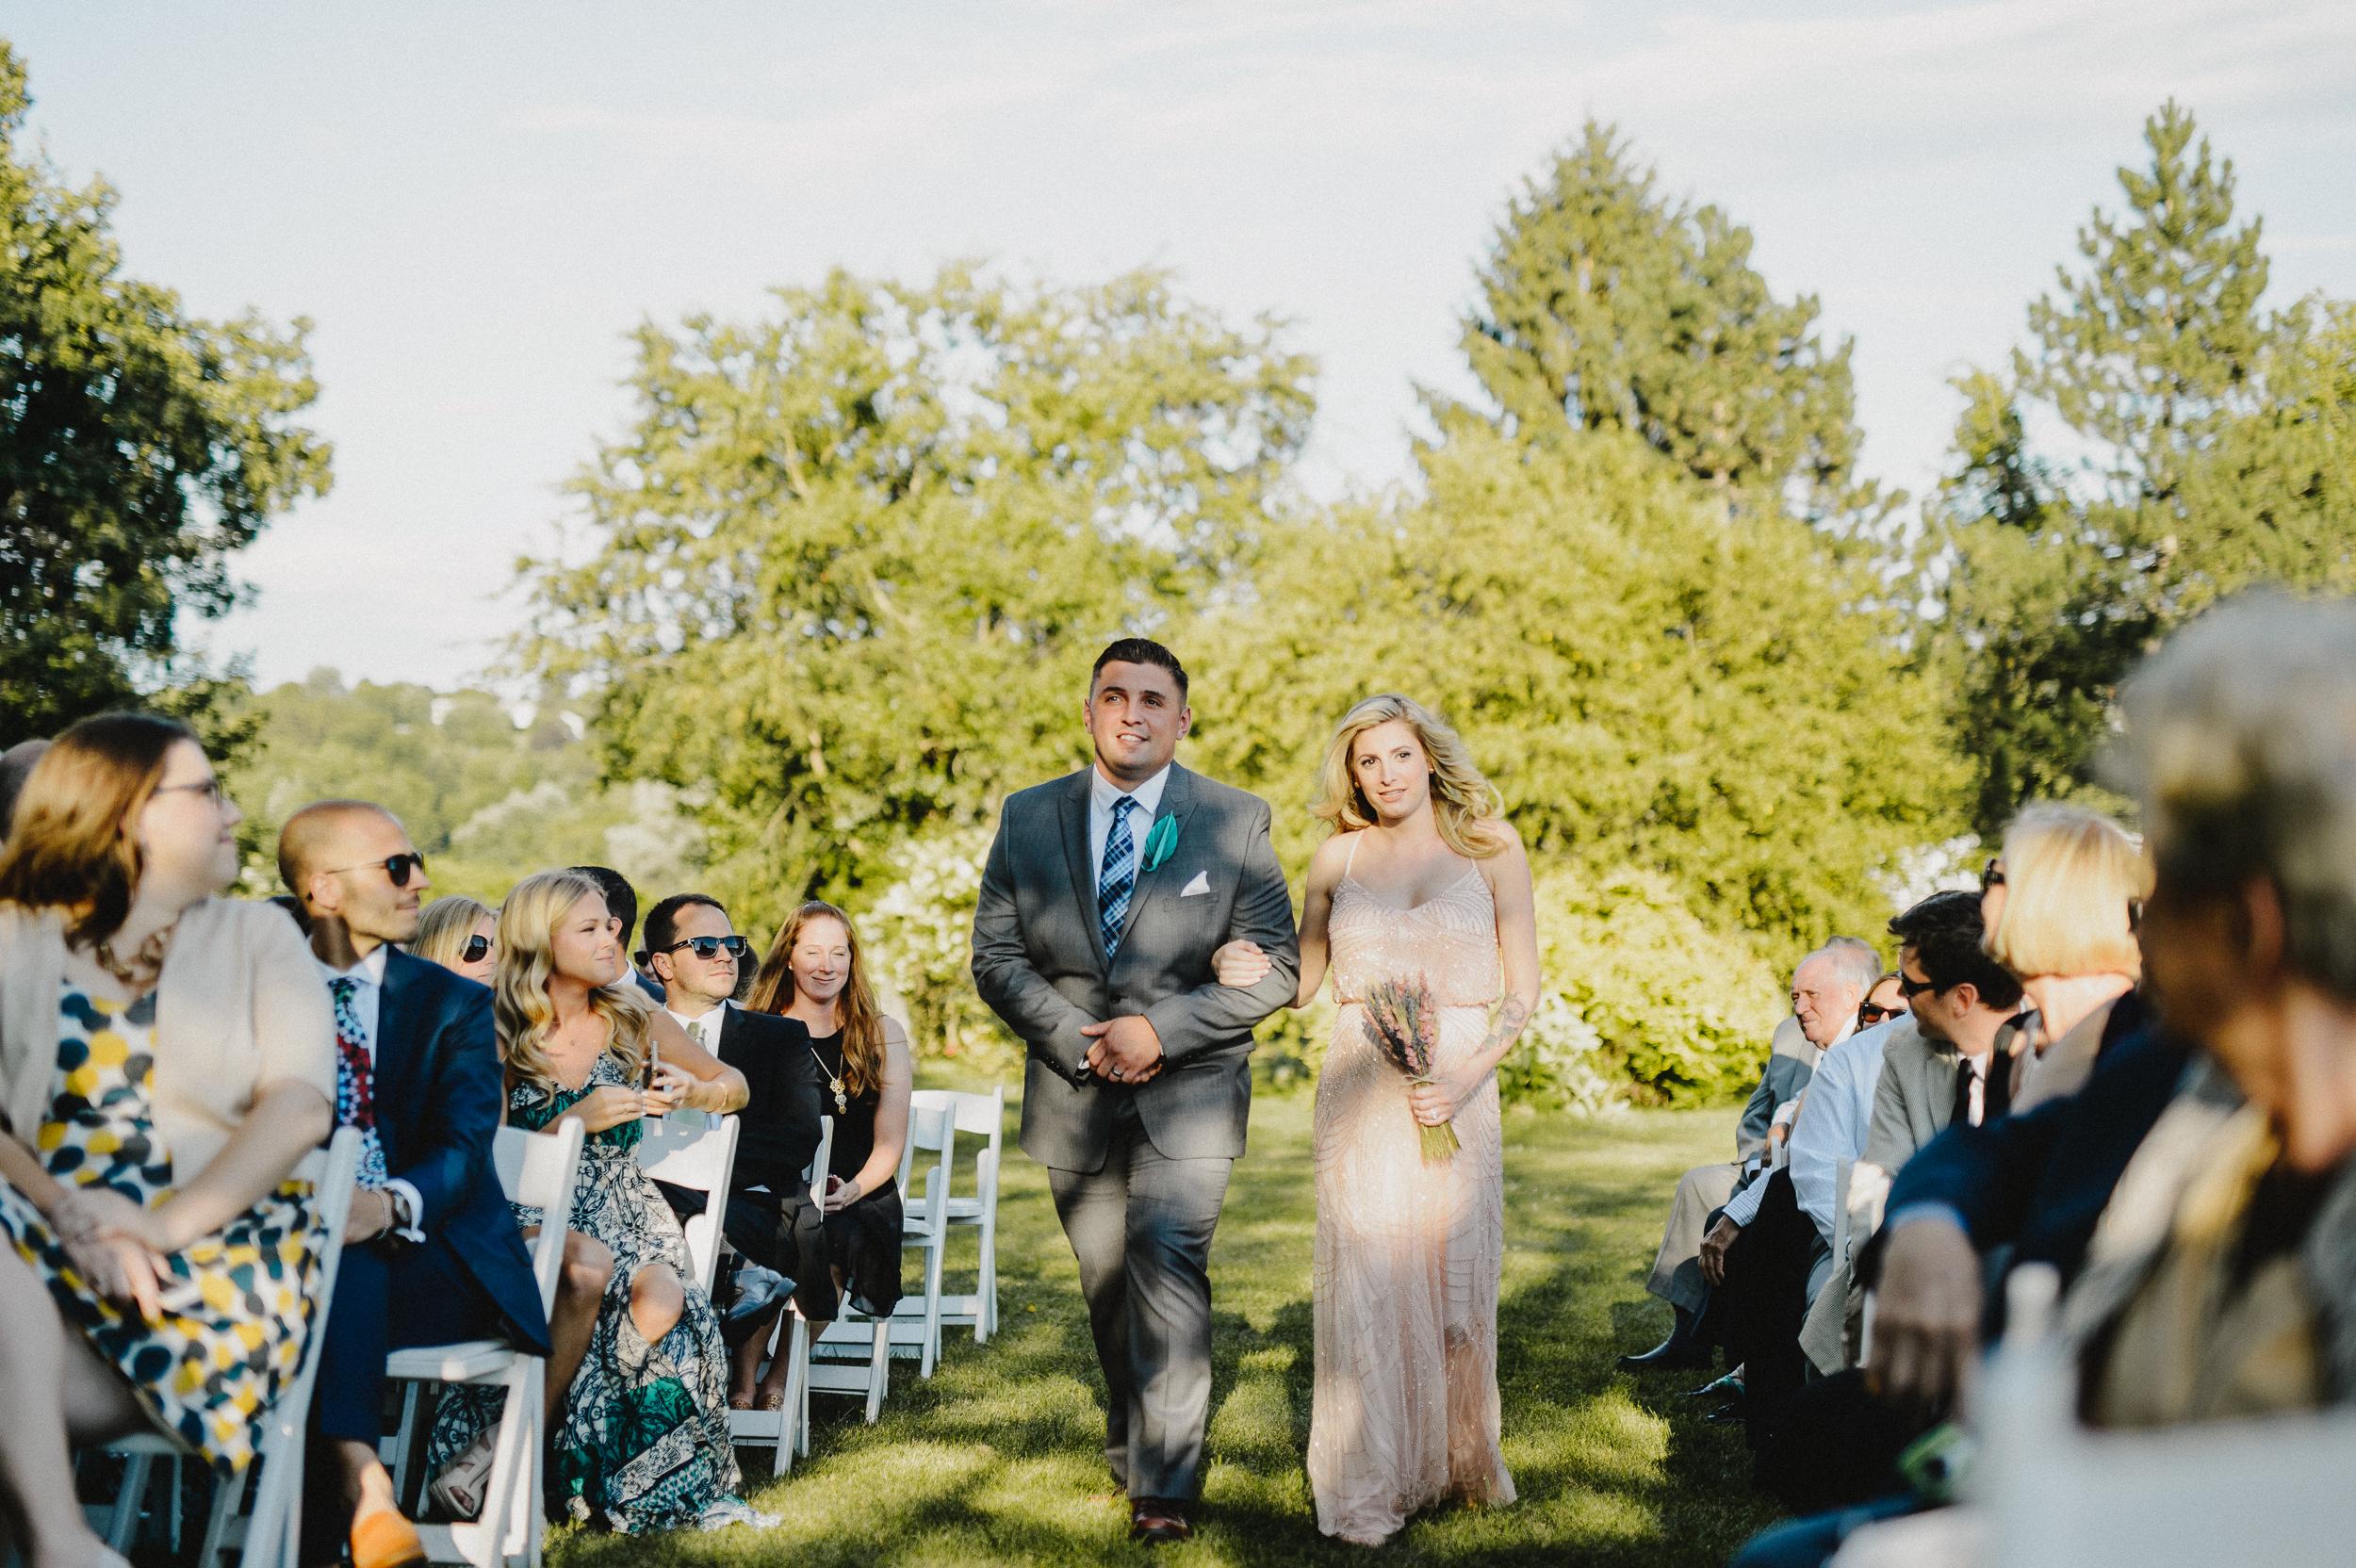 Pioneer-farms-warwick-new-york-wedding-photographer055.jpg